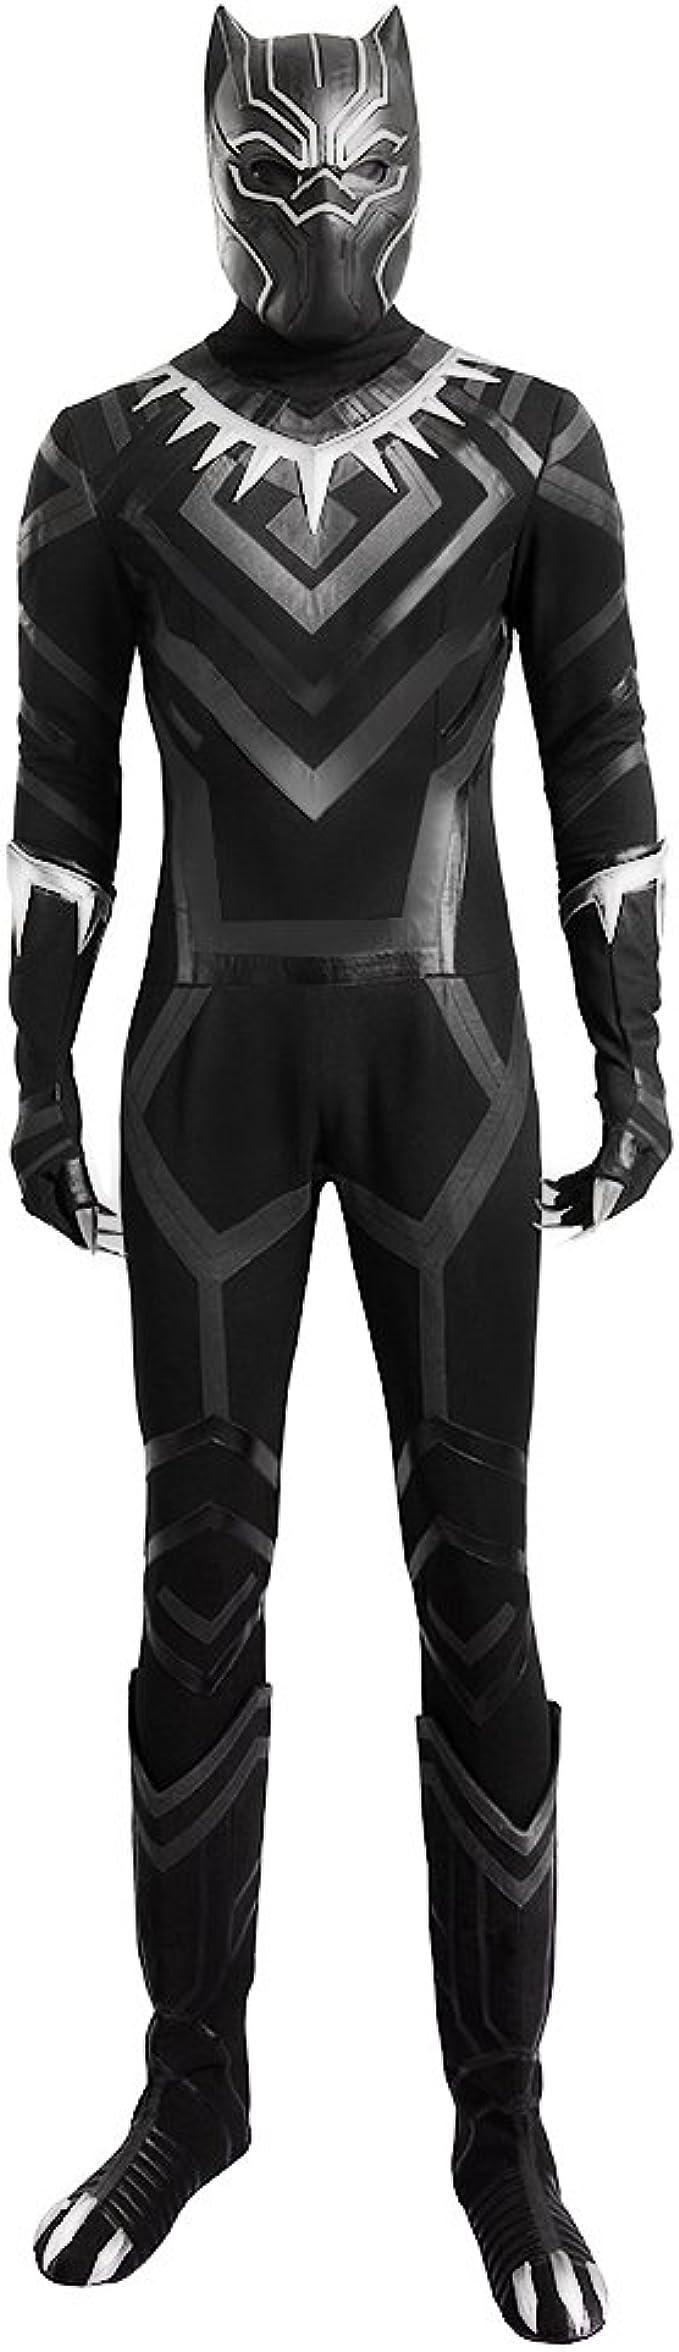 hzym Hombre Capitán América 3 Guerra Civil Black Panther cosplay ...